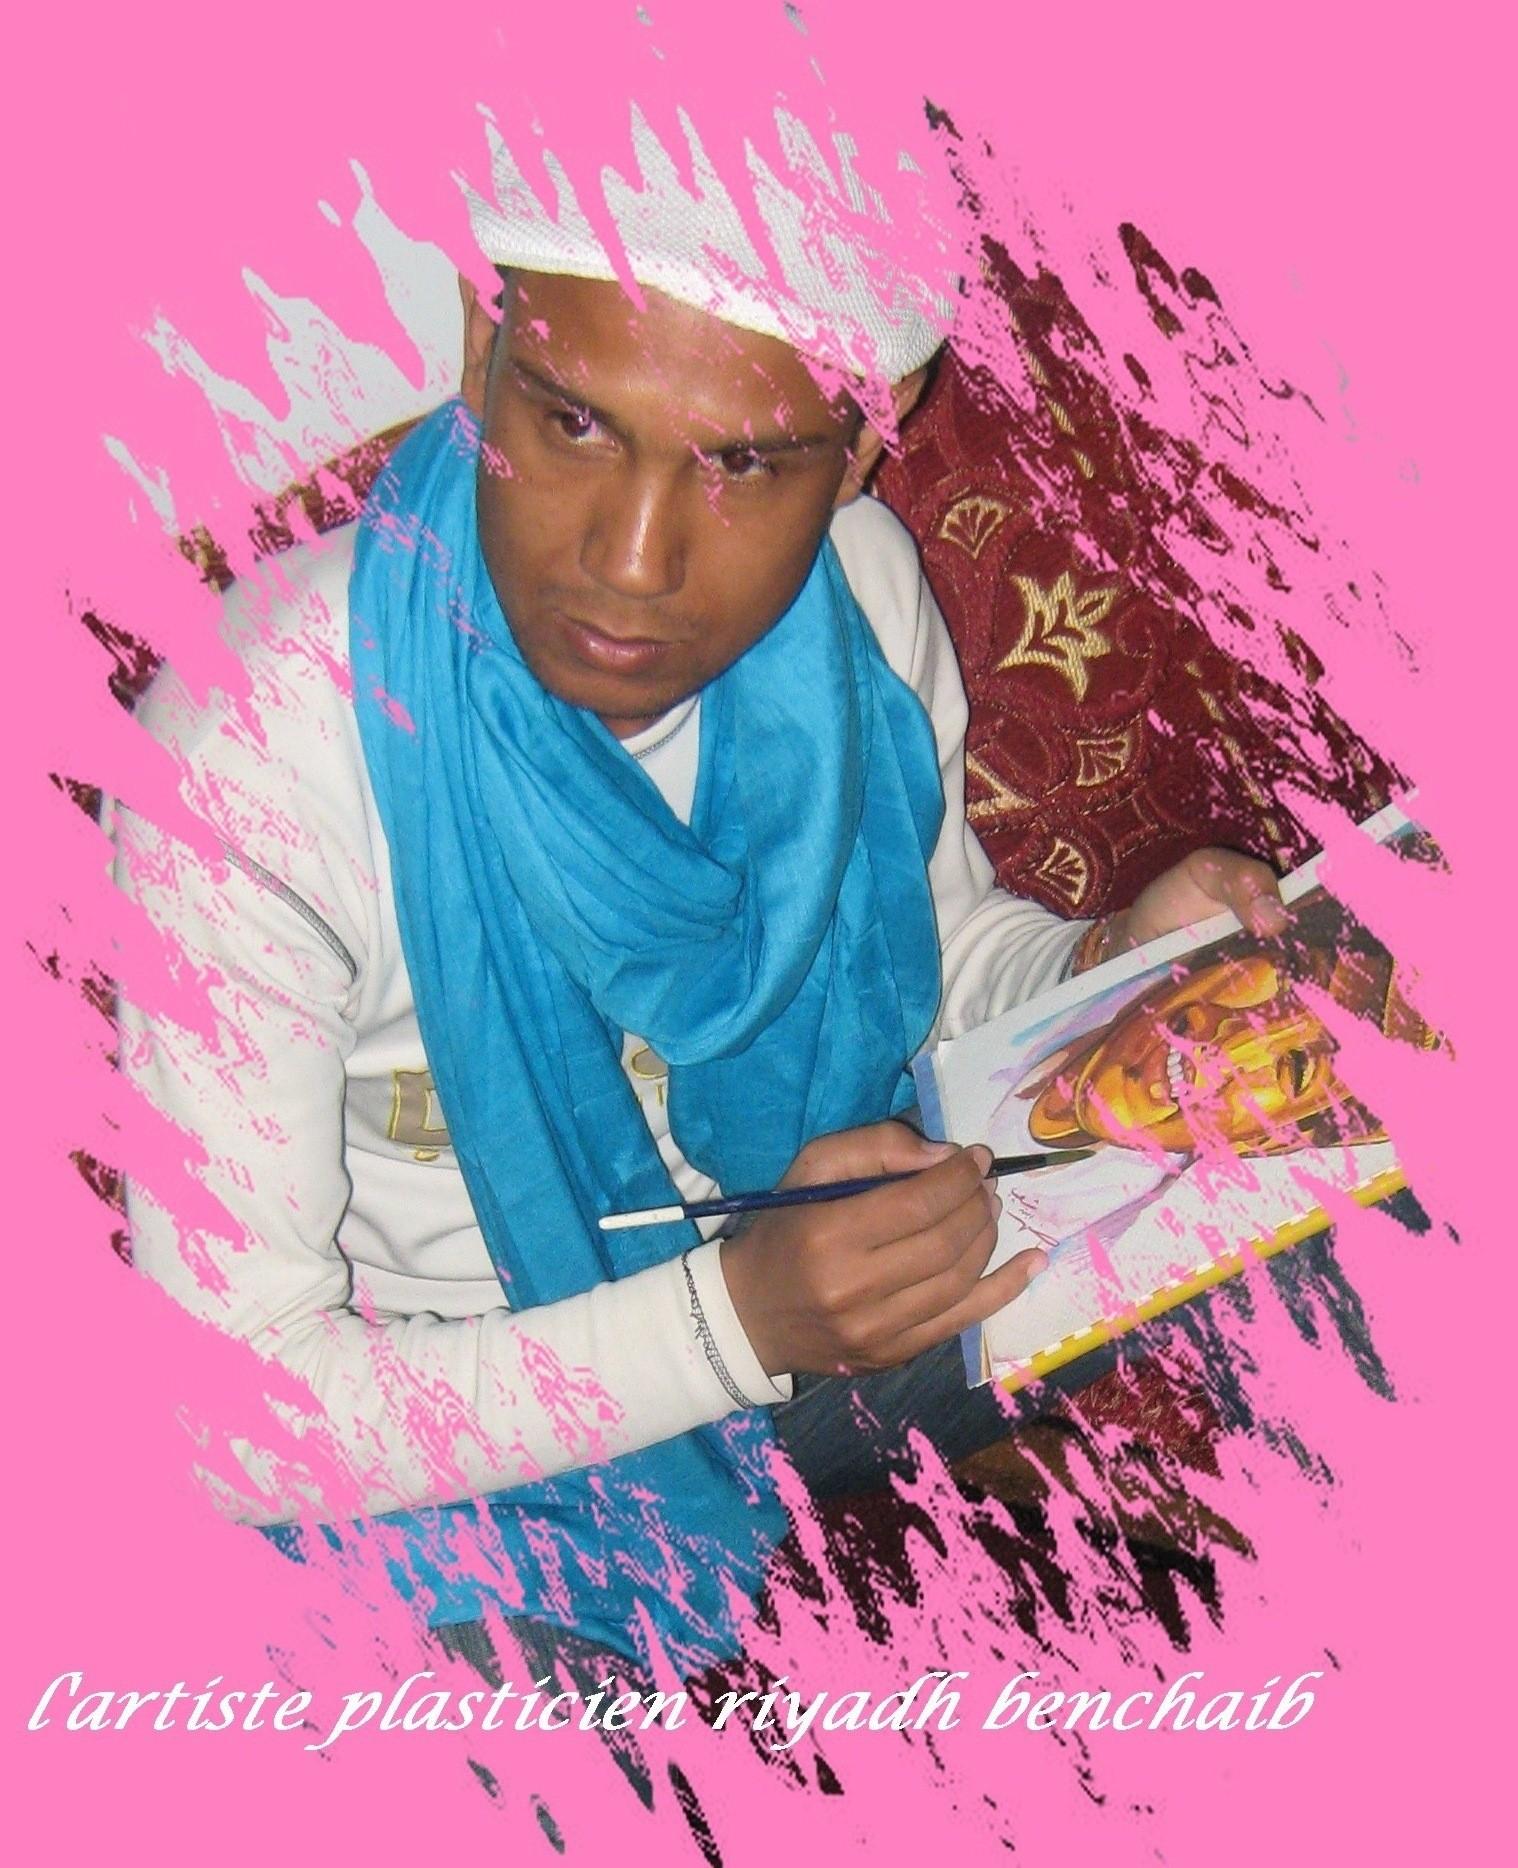 l'artiste plasticien riyadh benchaib